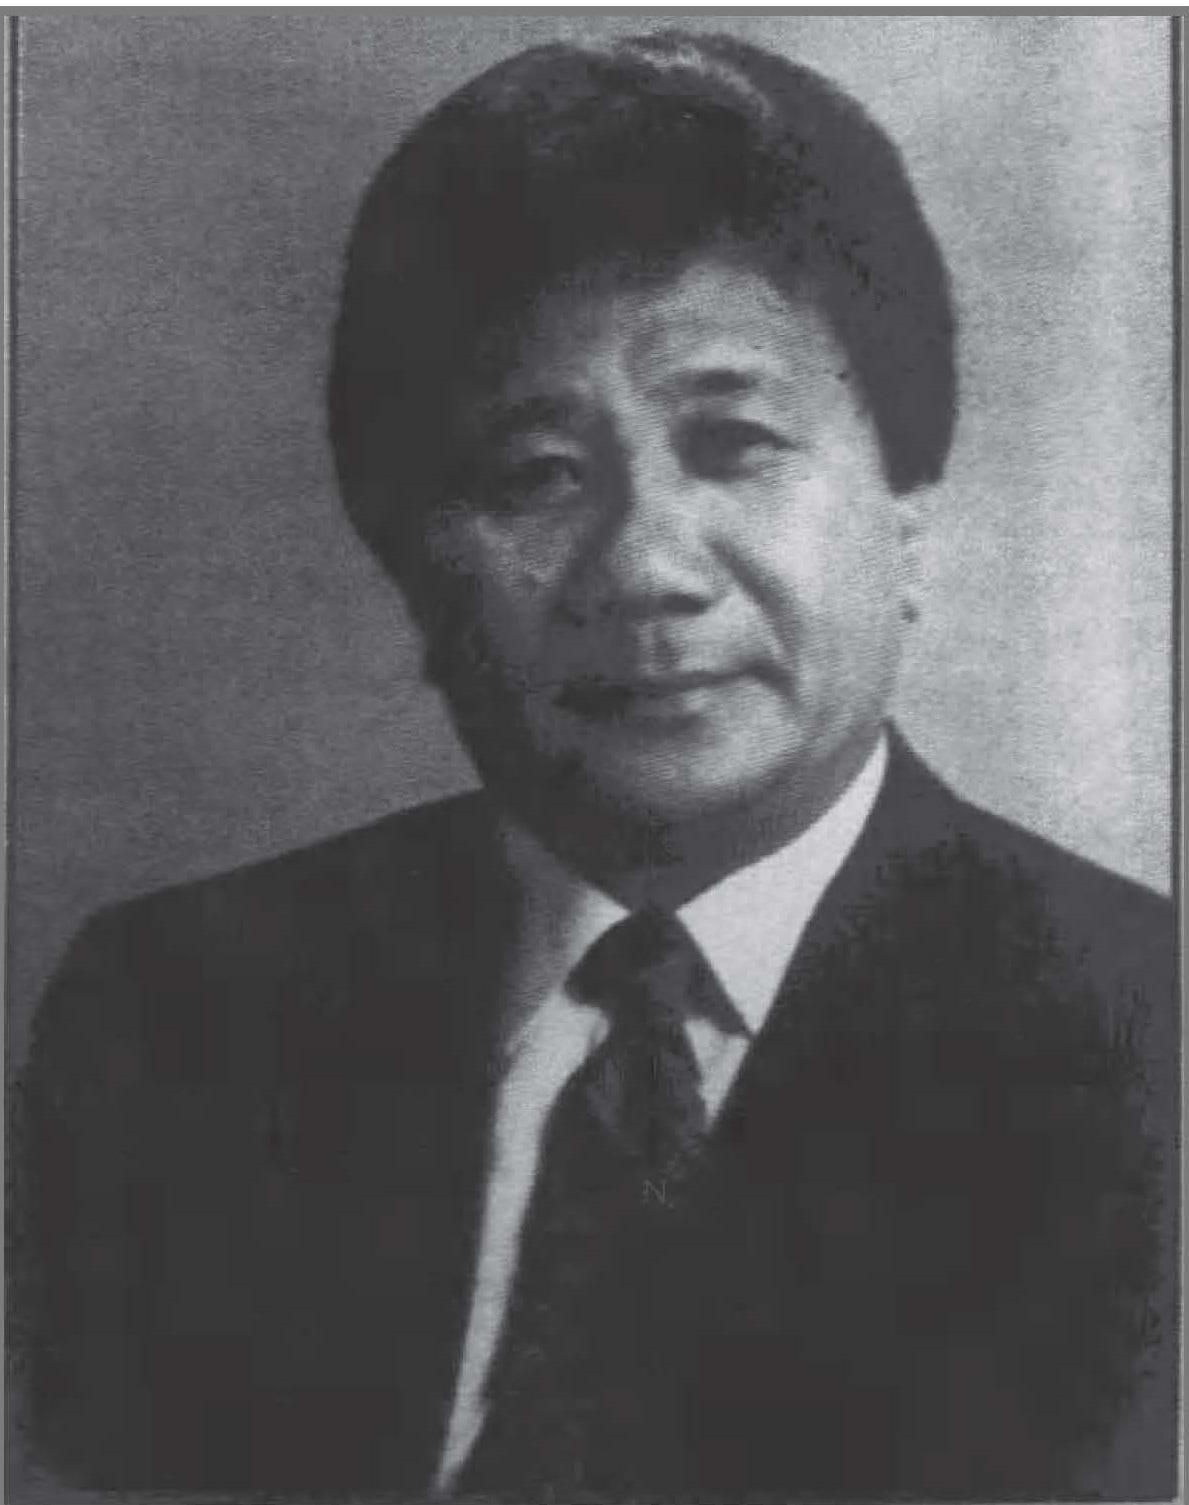 Kuniwo Nakamura in 1989